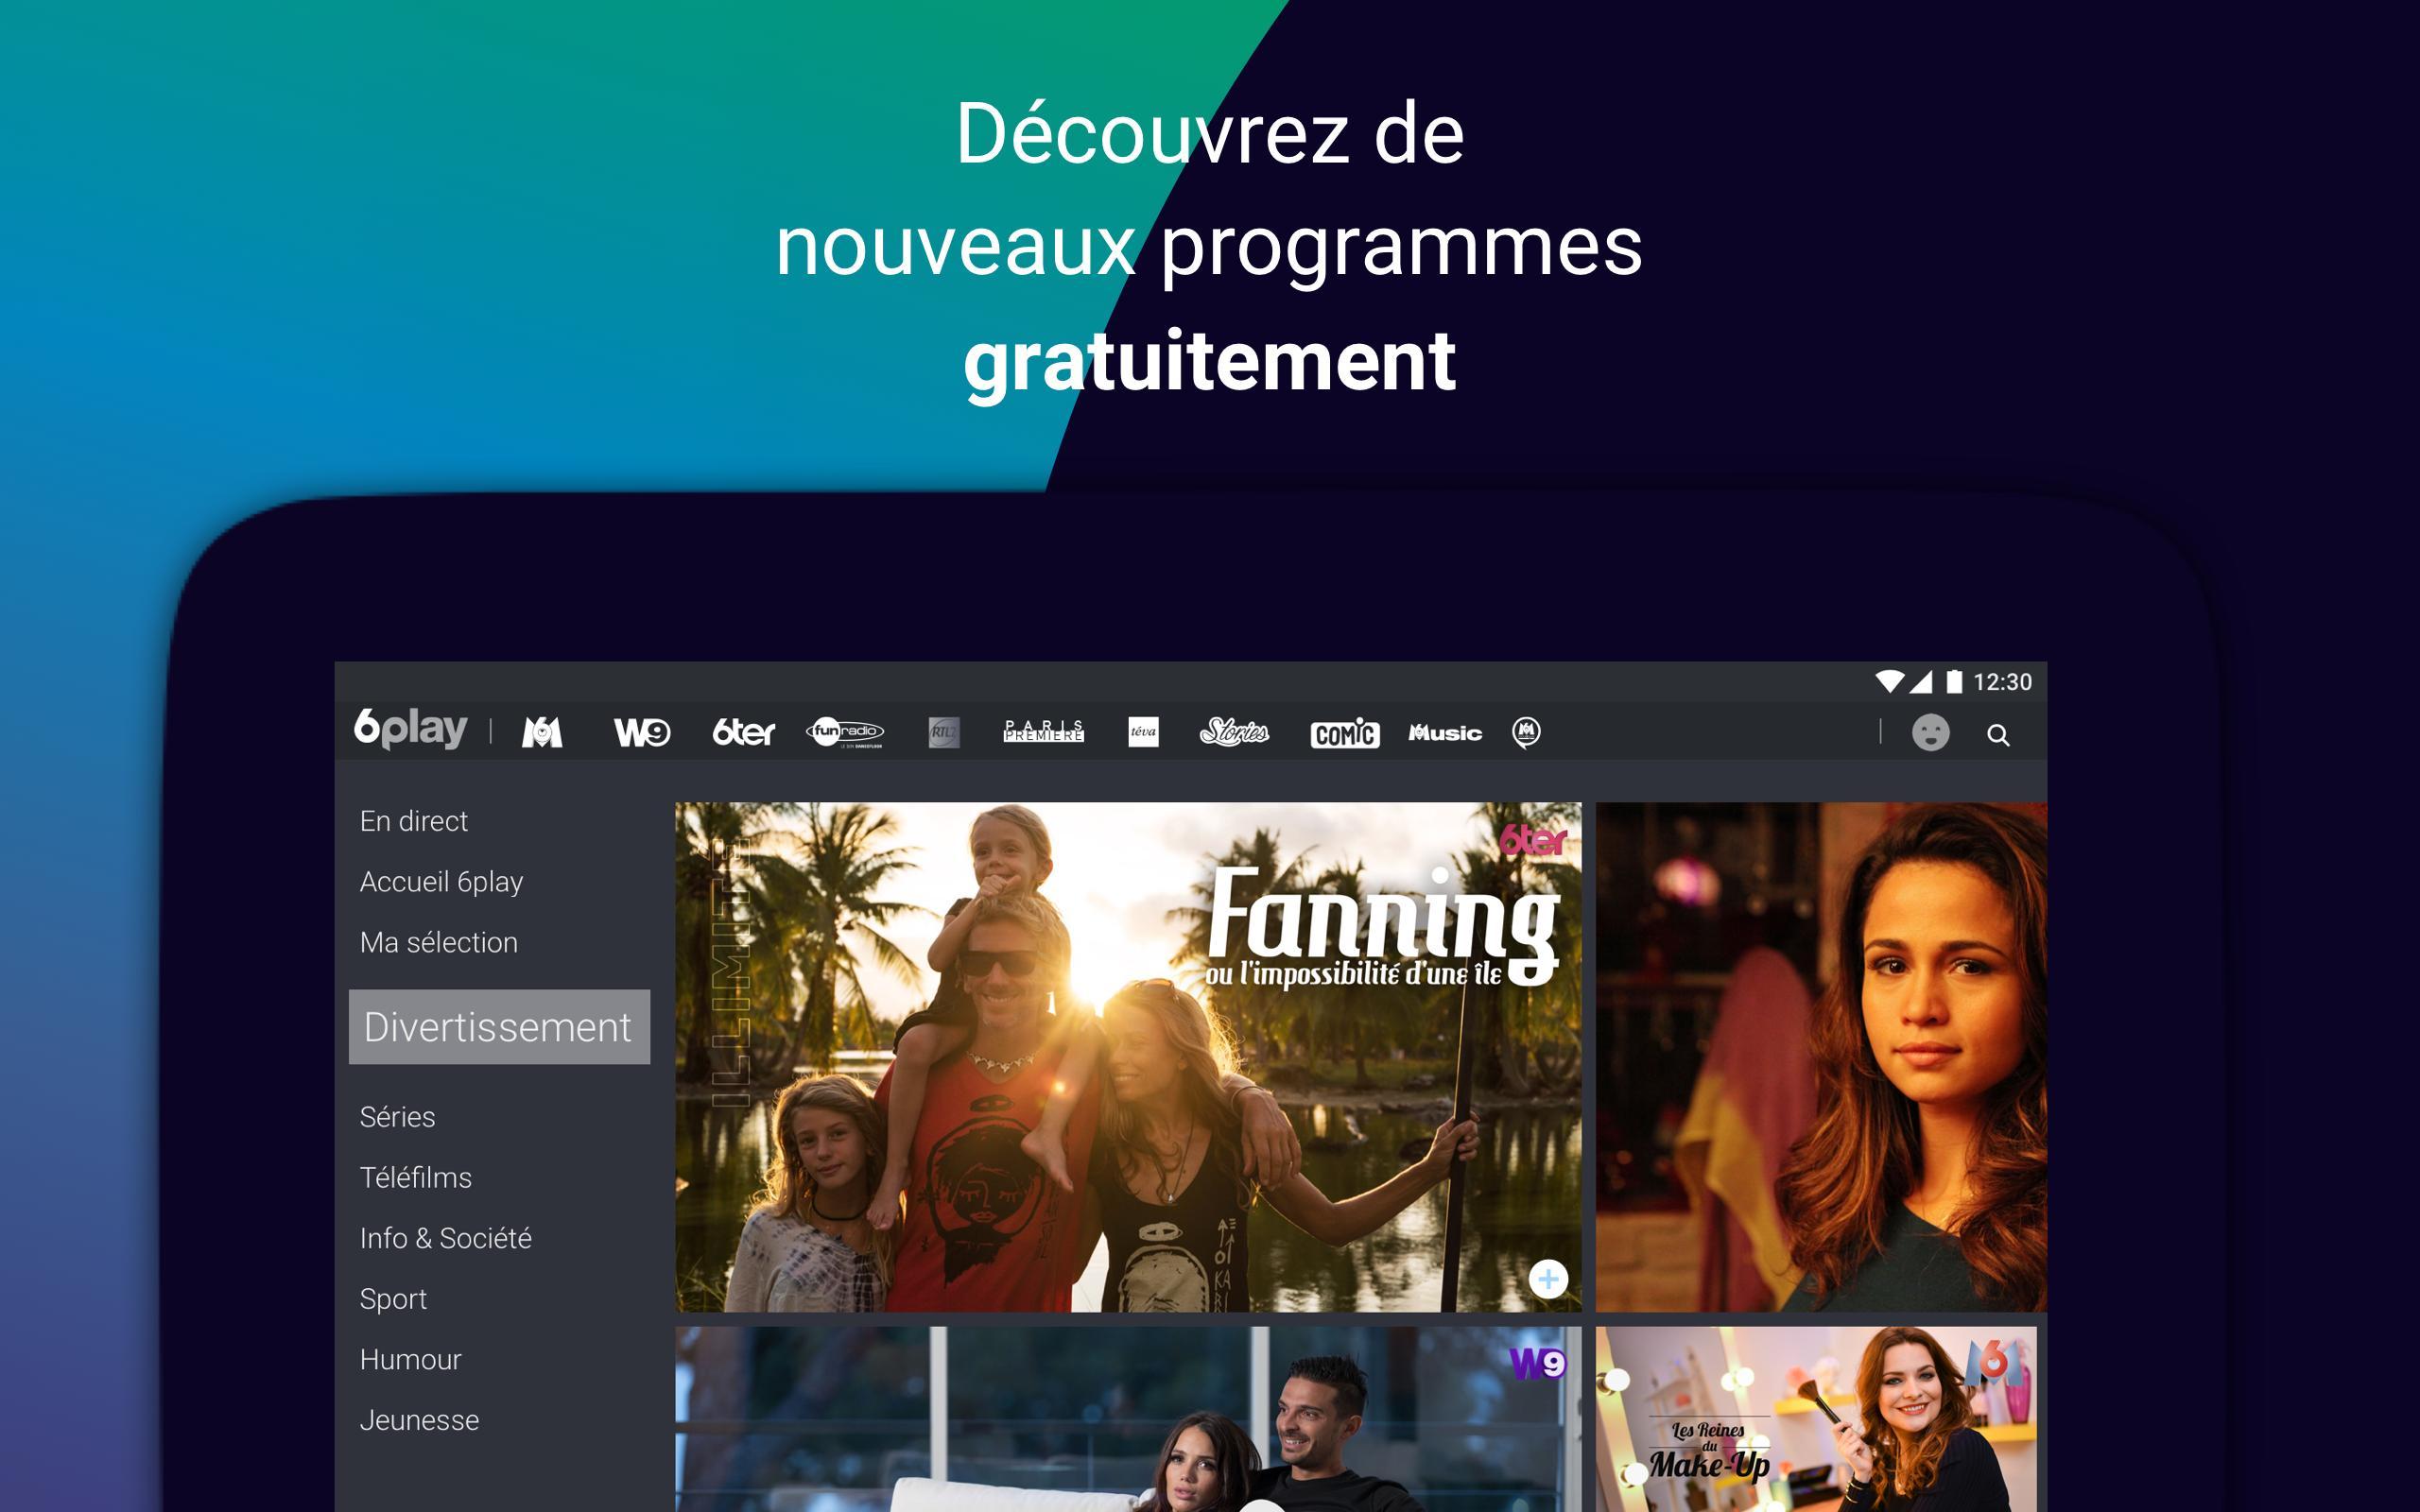 mannen / man beste leverancier promotie 6play, TV en direct et replay for Android - APK Download